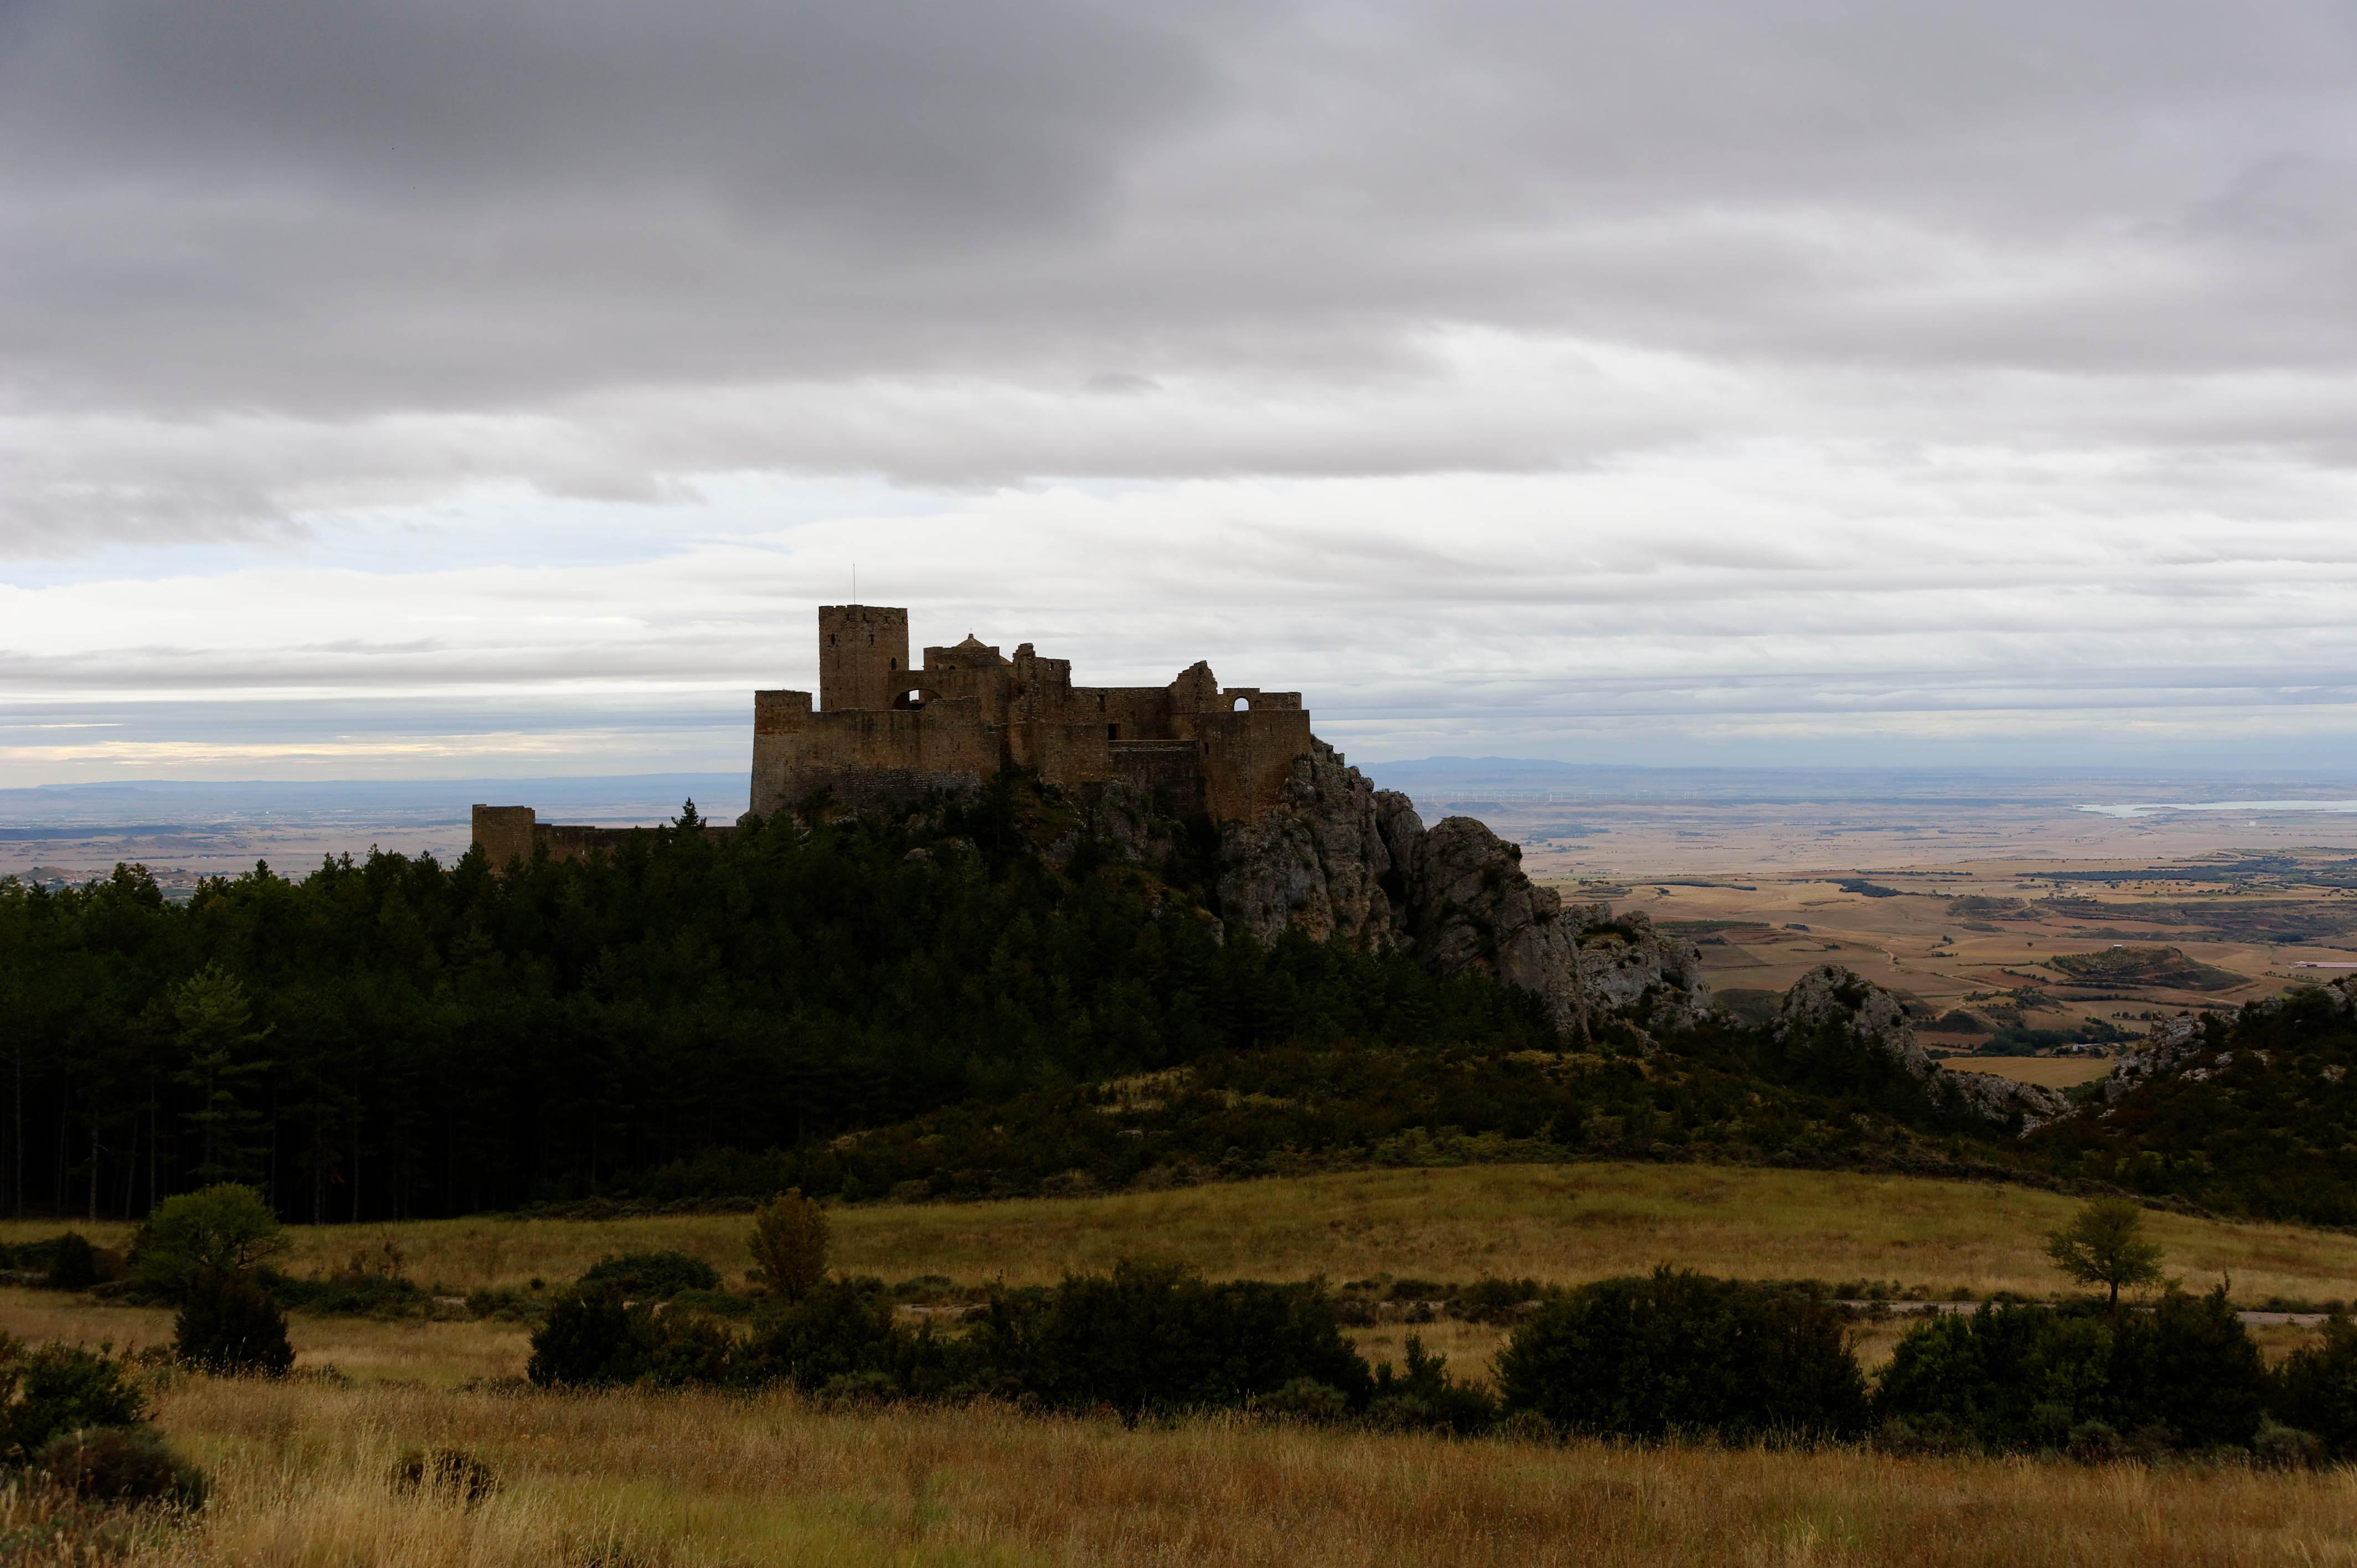 3645_Chateau de Loarre (Aragon)